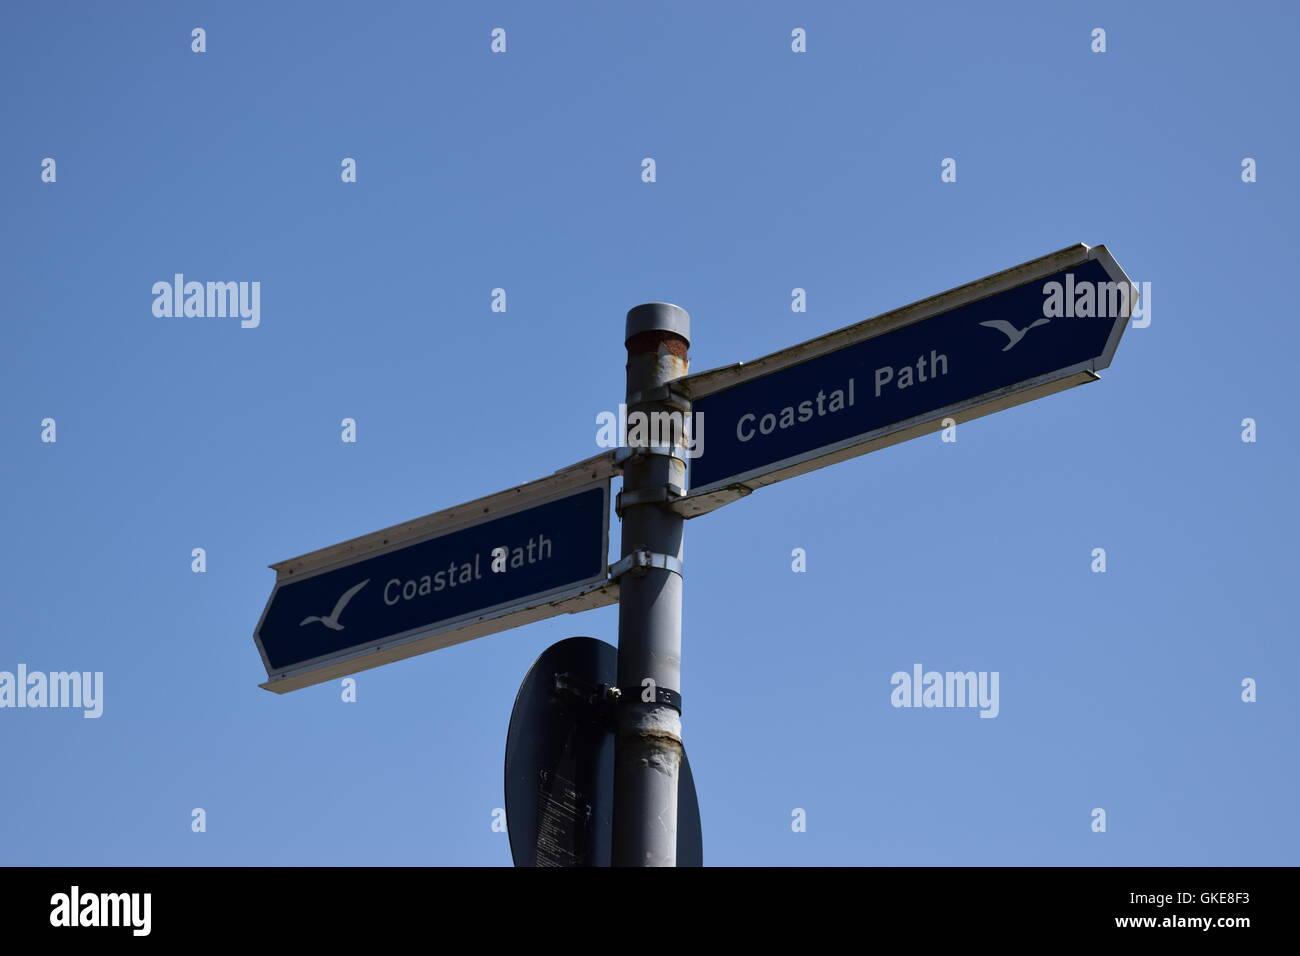 Blue Coastal Path Signs Direct - Stock Image